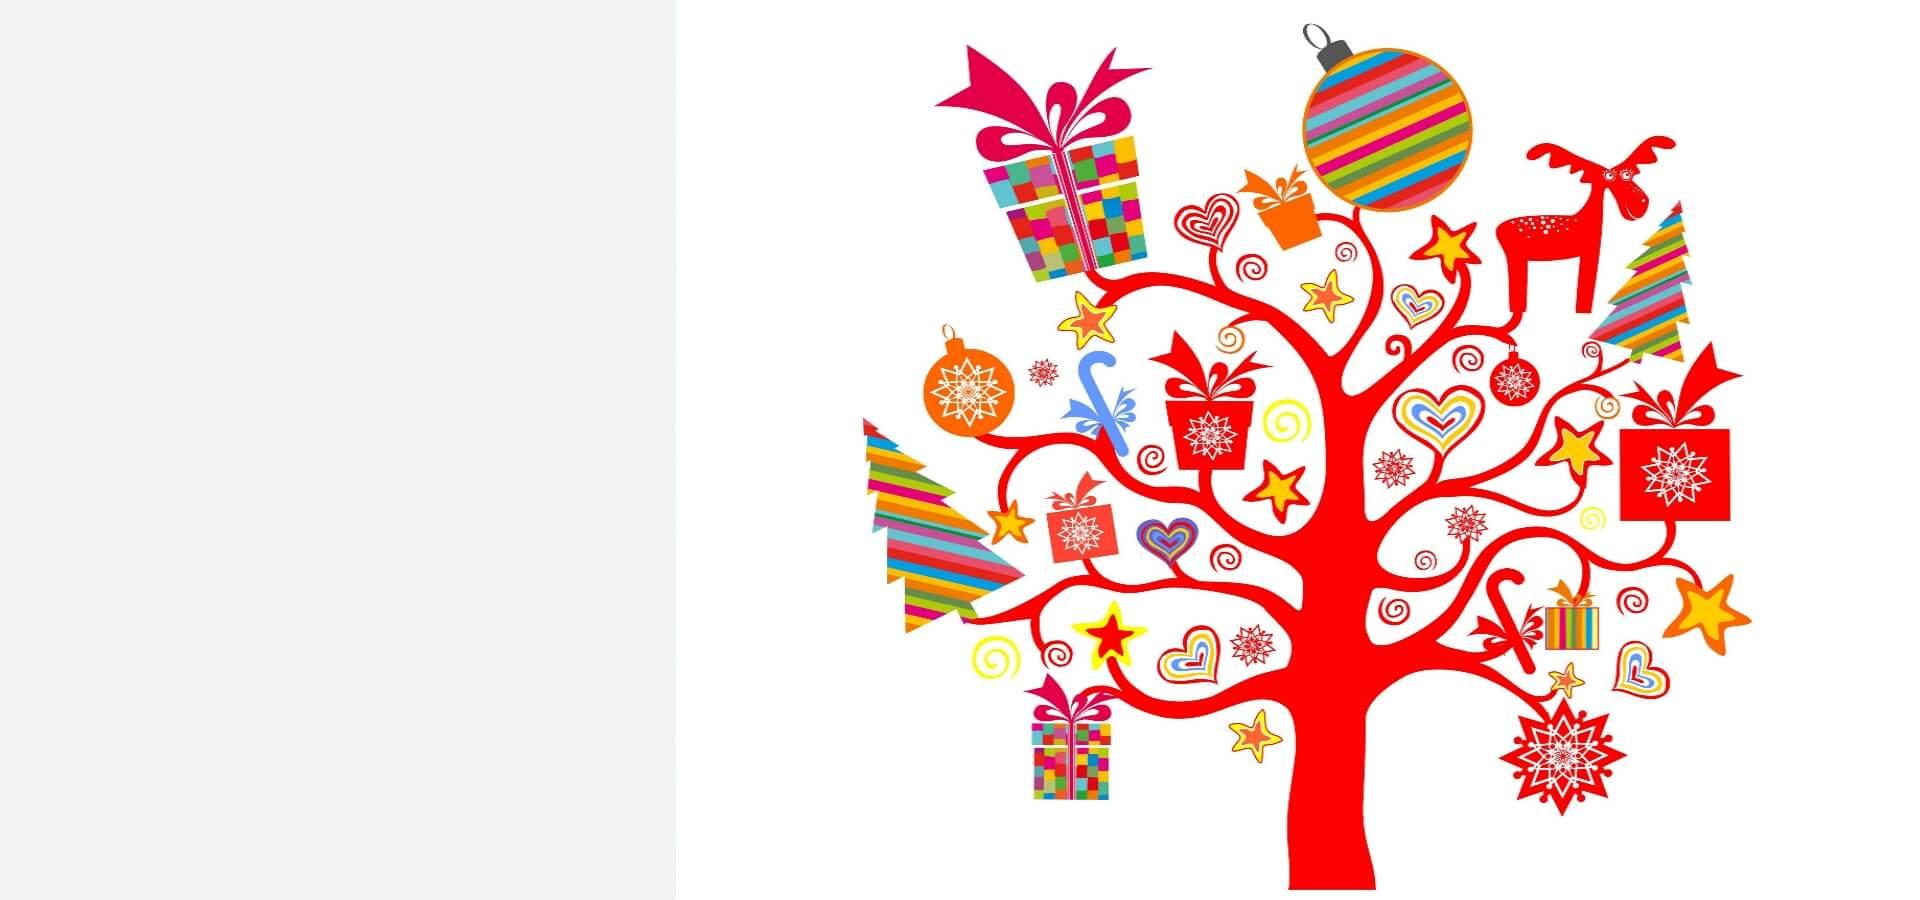 vaikų darželis vilnius vilniuje medis vaiko